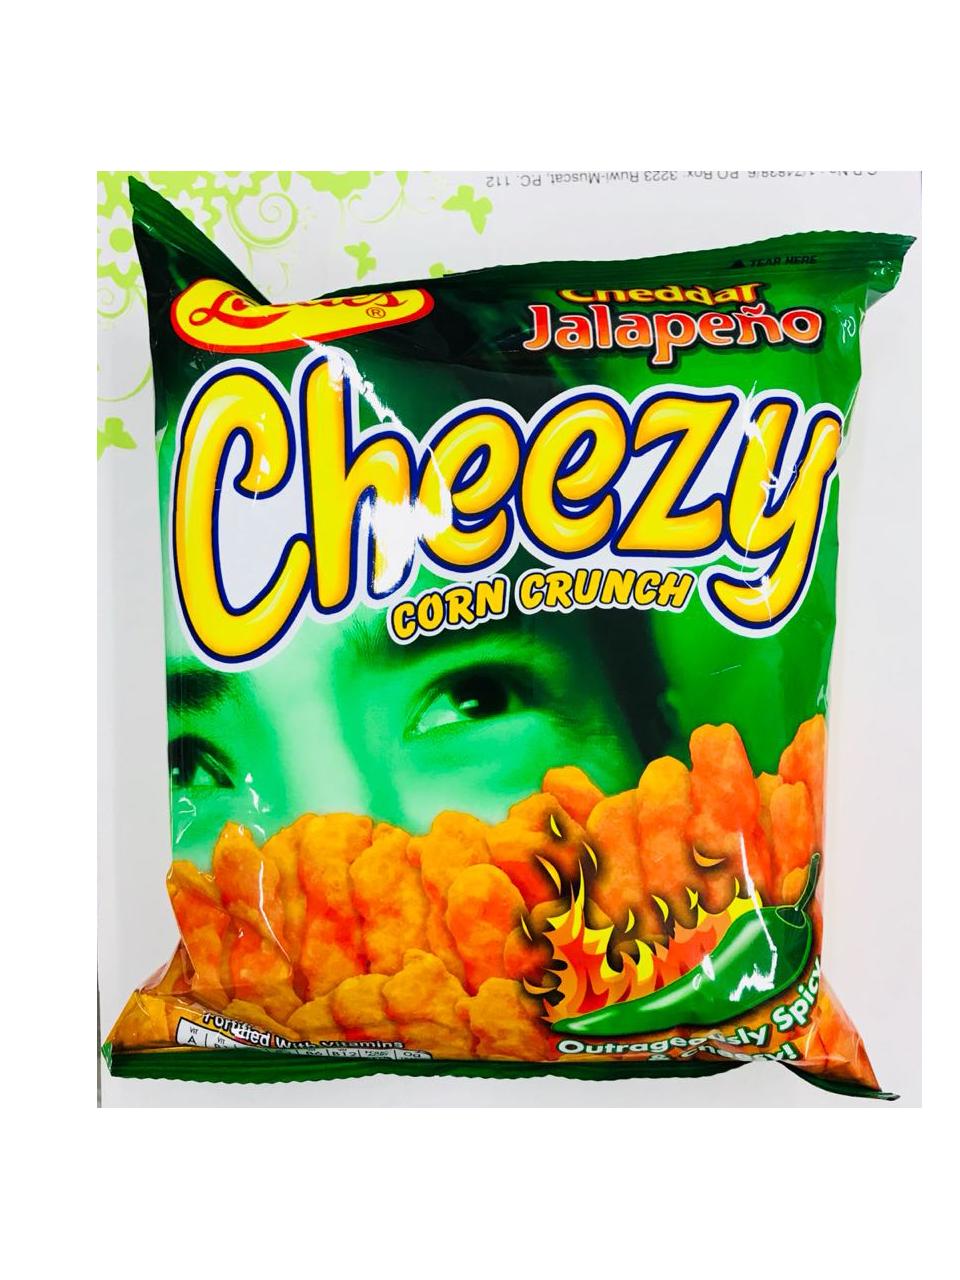 Leslie Cheezy Corn Crunch Cheddar Jalapeno 70g